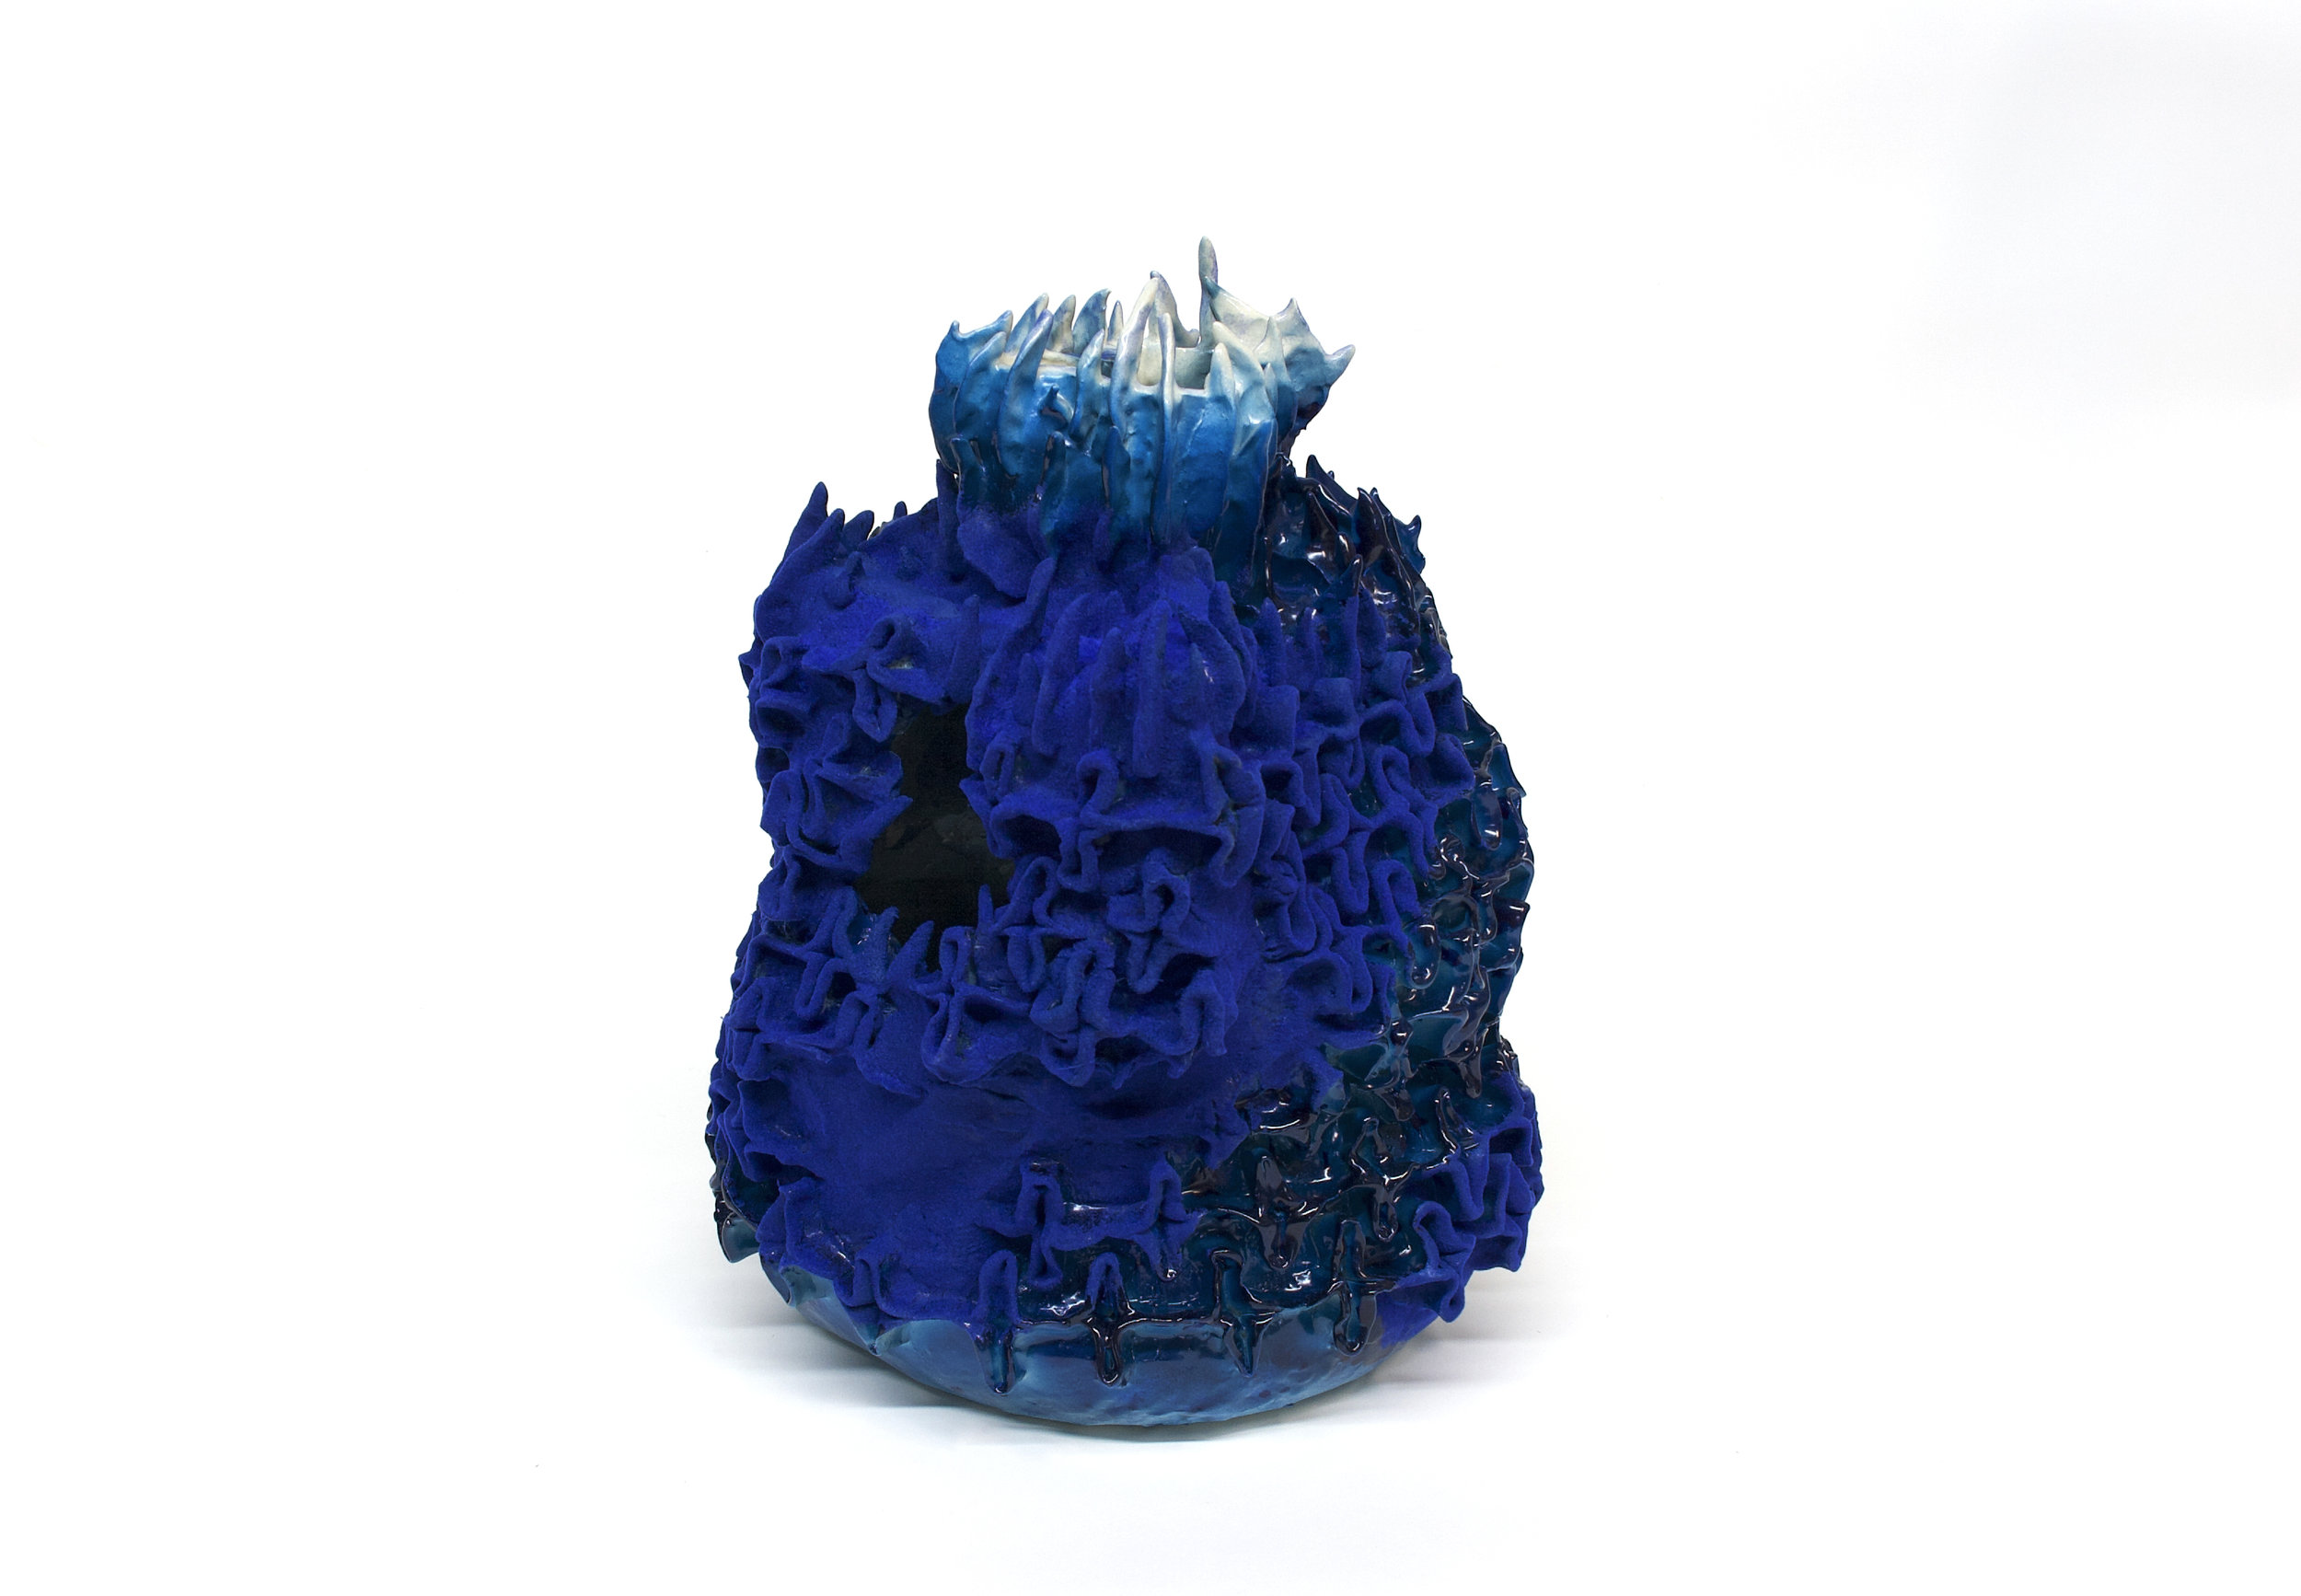 "Philippe Caron Lefebvre,  Le malin,   2019, ceramic, paint and flocking, 43 x 31 x 31 cm (17"" x 12"" x 12"")"